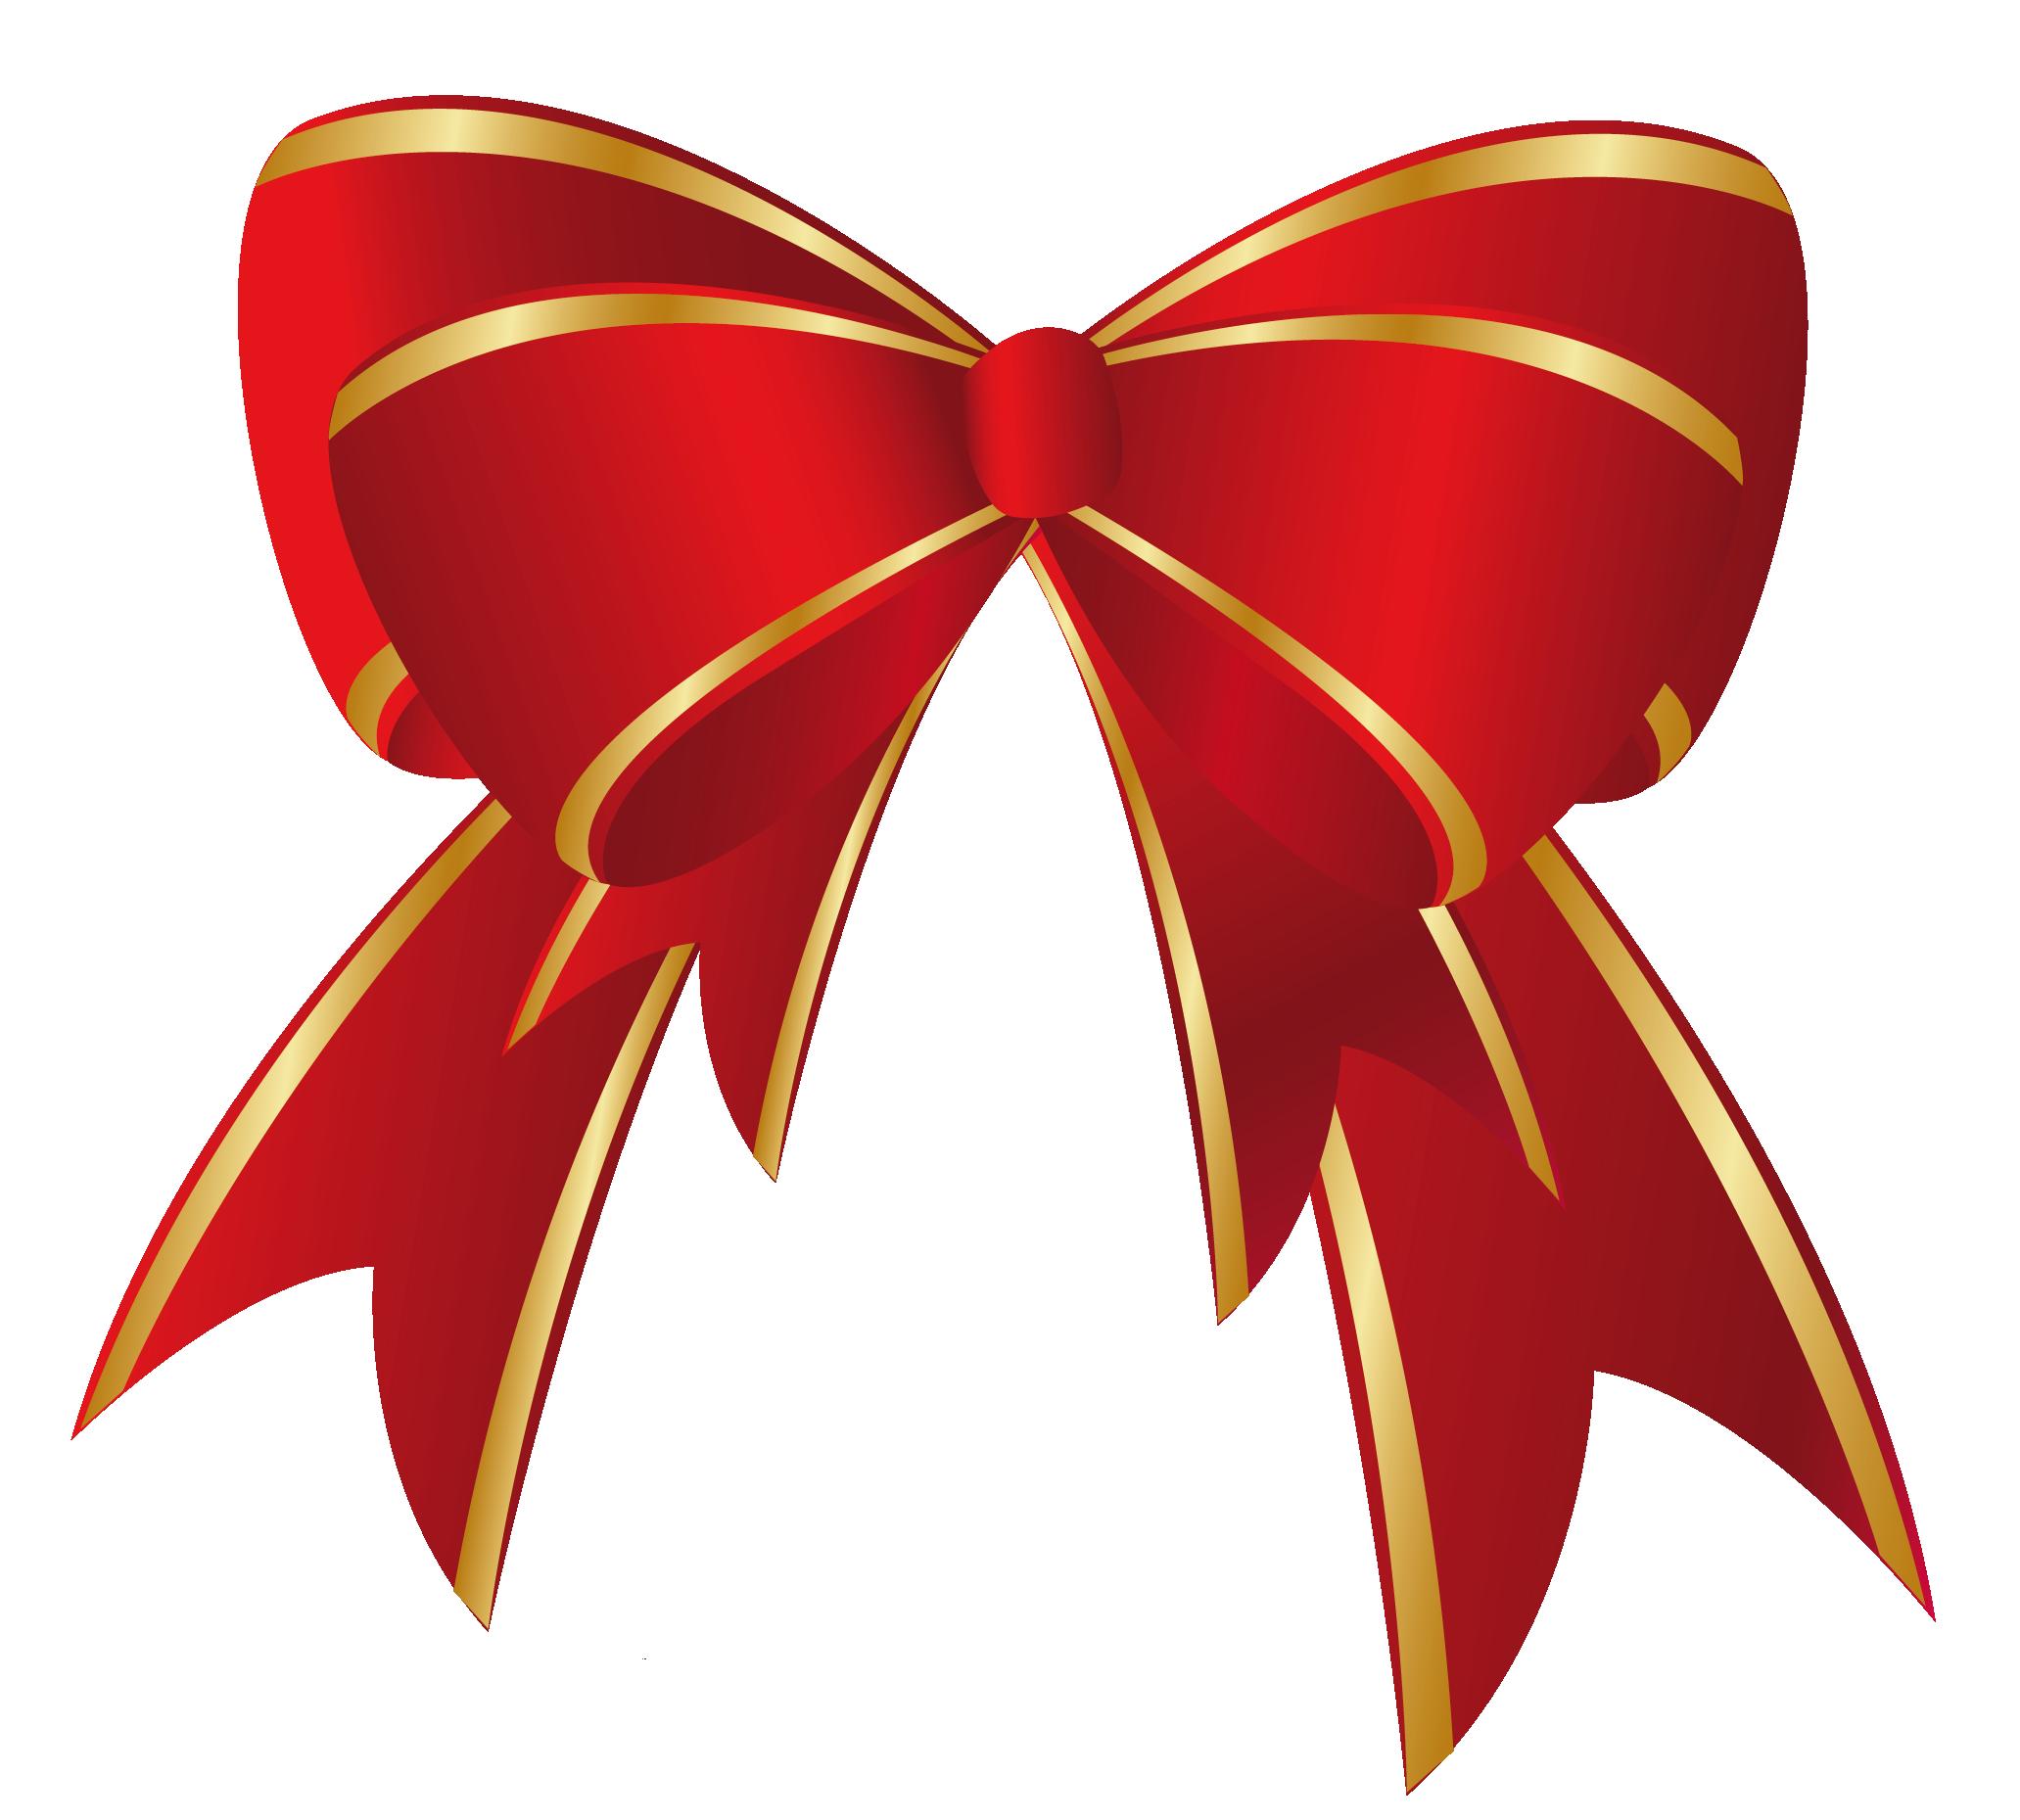 Bow Clip Art Free Cliparts Co-Bow Clip Art Free Cliparts Co-1